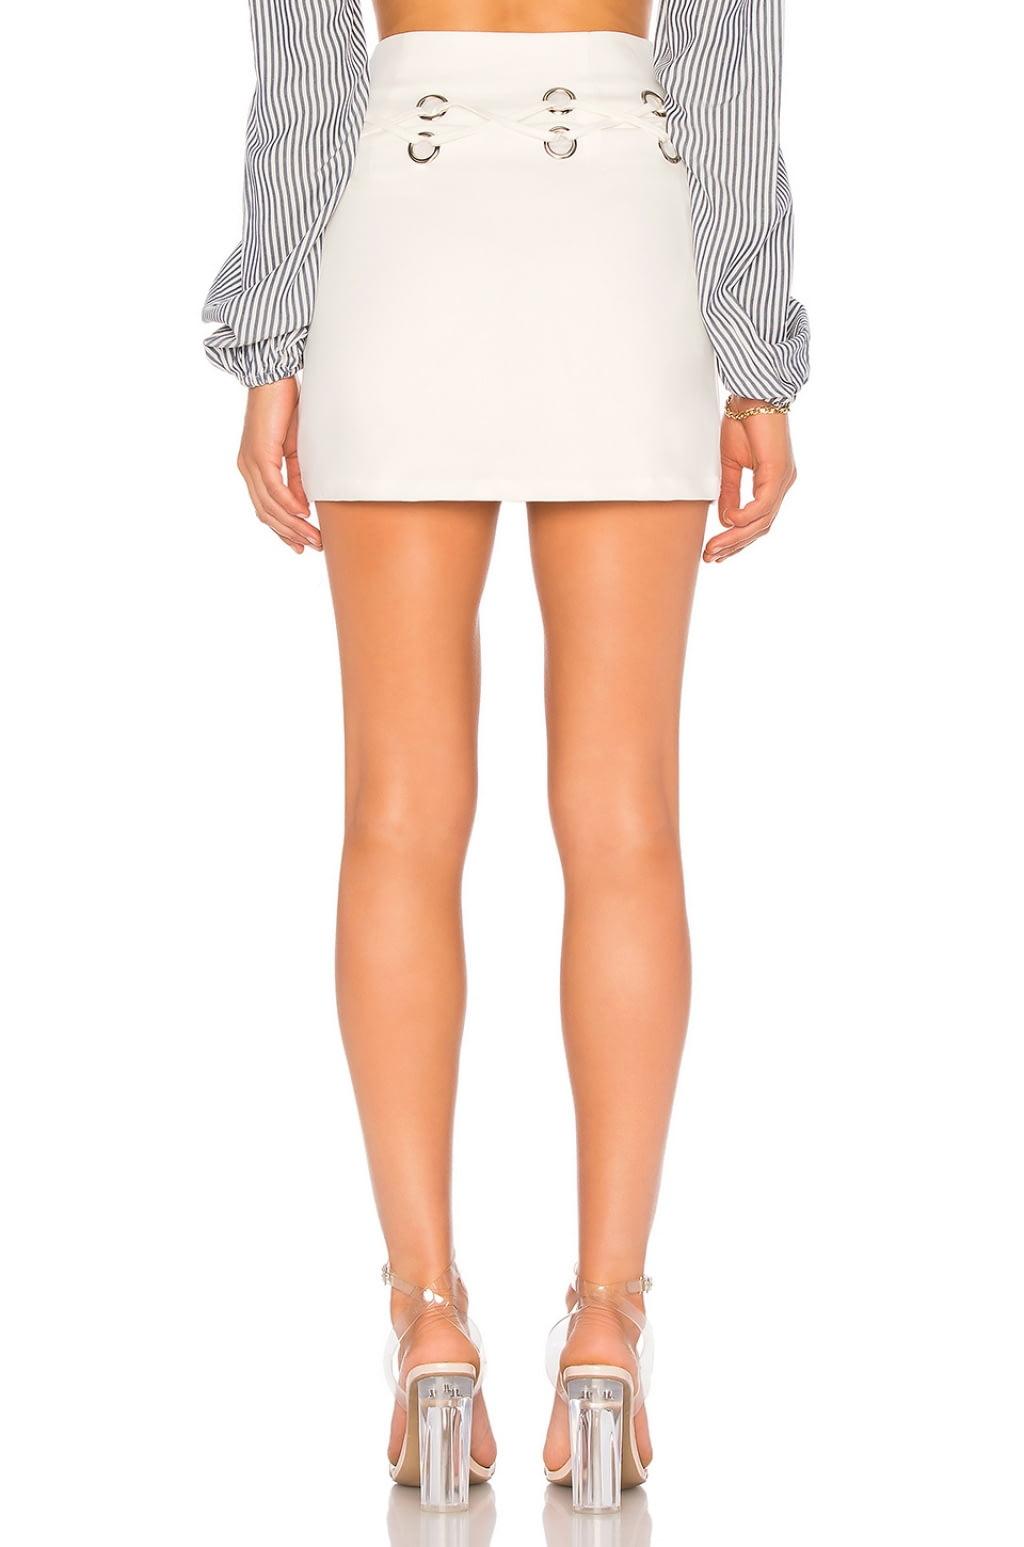 Venetia Mini Skirt in White. - size M (also in L,S,XS,XXS) by the way.